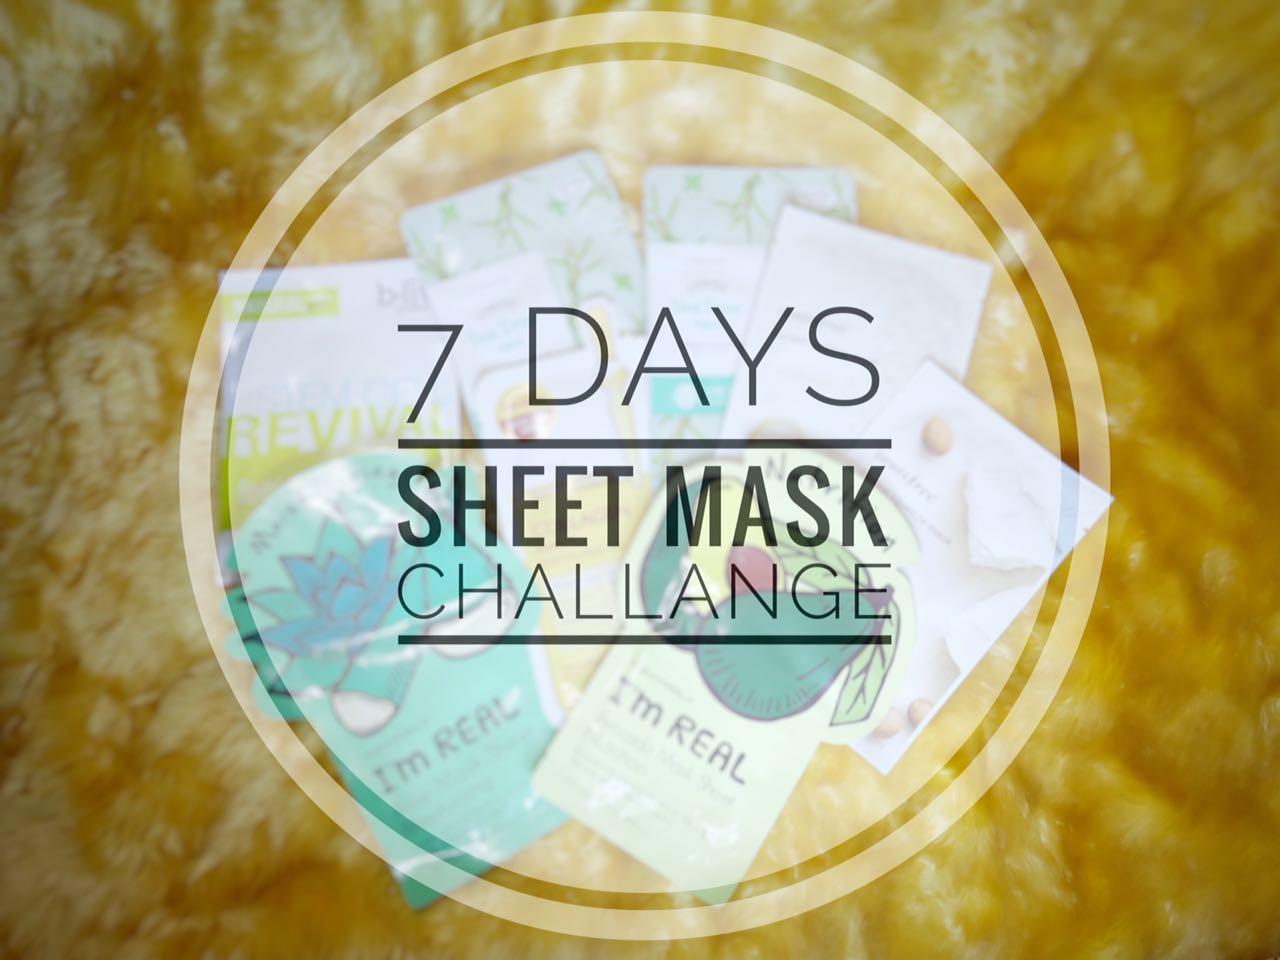 Nyonya Nyinyas Room 7 Hari Memakai Sheet Mask Innisfree Its Real Squeeze Masker Wajah Atau Tisu Adalah Produk Perawatan Yang Sangat Populer Di Korea Selatan Bentuknya Simpel Serta Kandungannya Lumayan